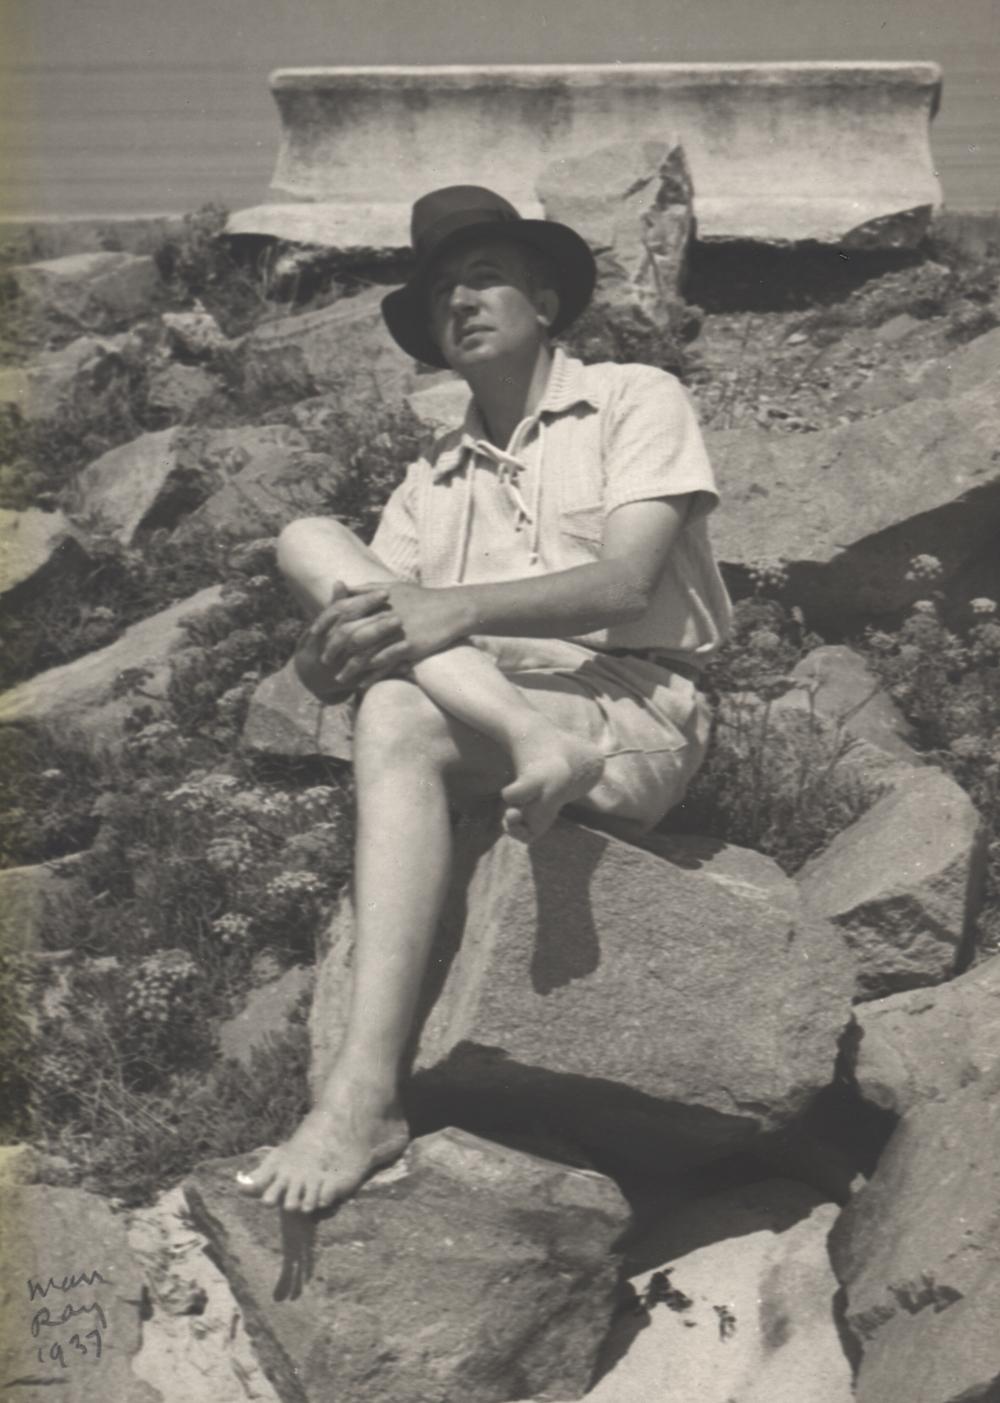 MAN RAY,  Paul Eluard Seated on Breakwater,  1937